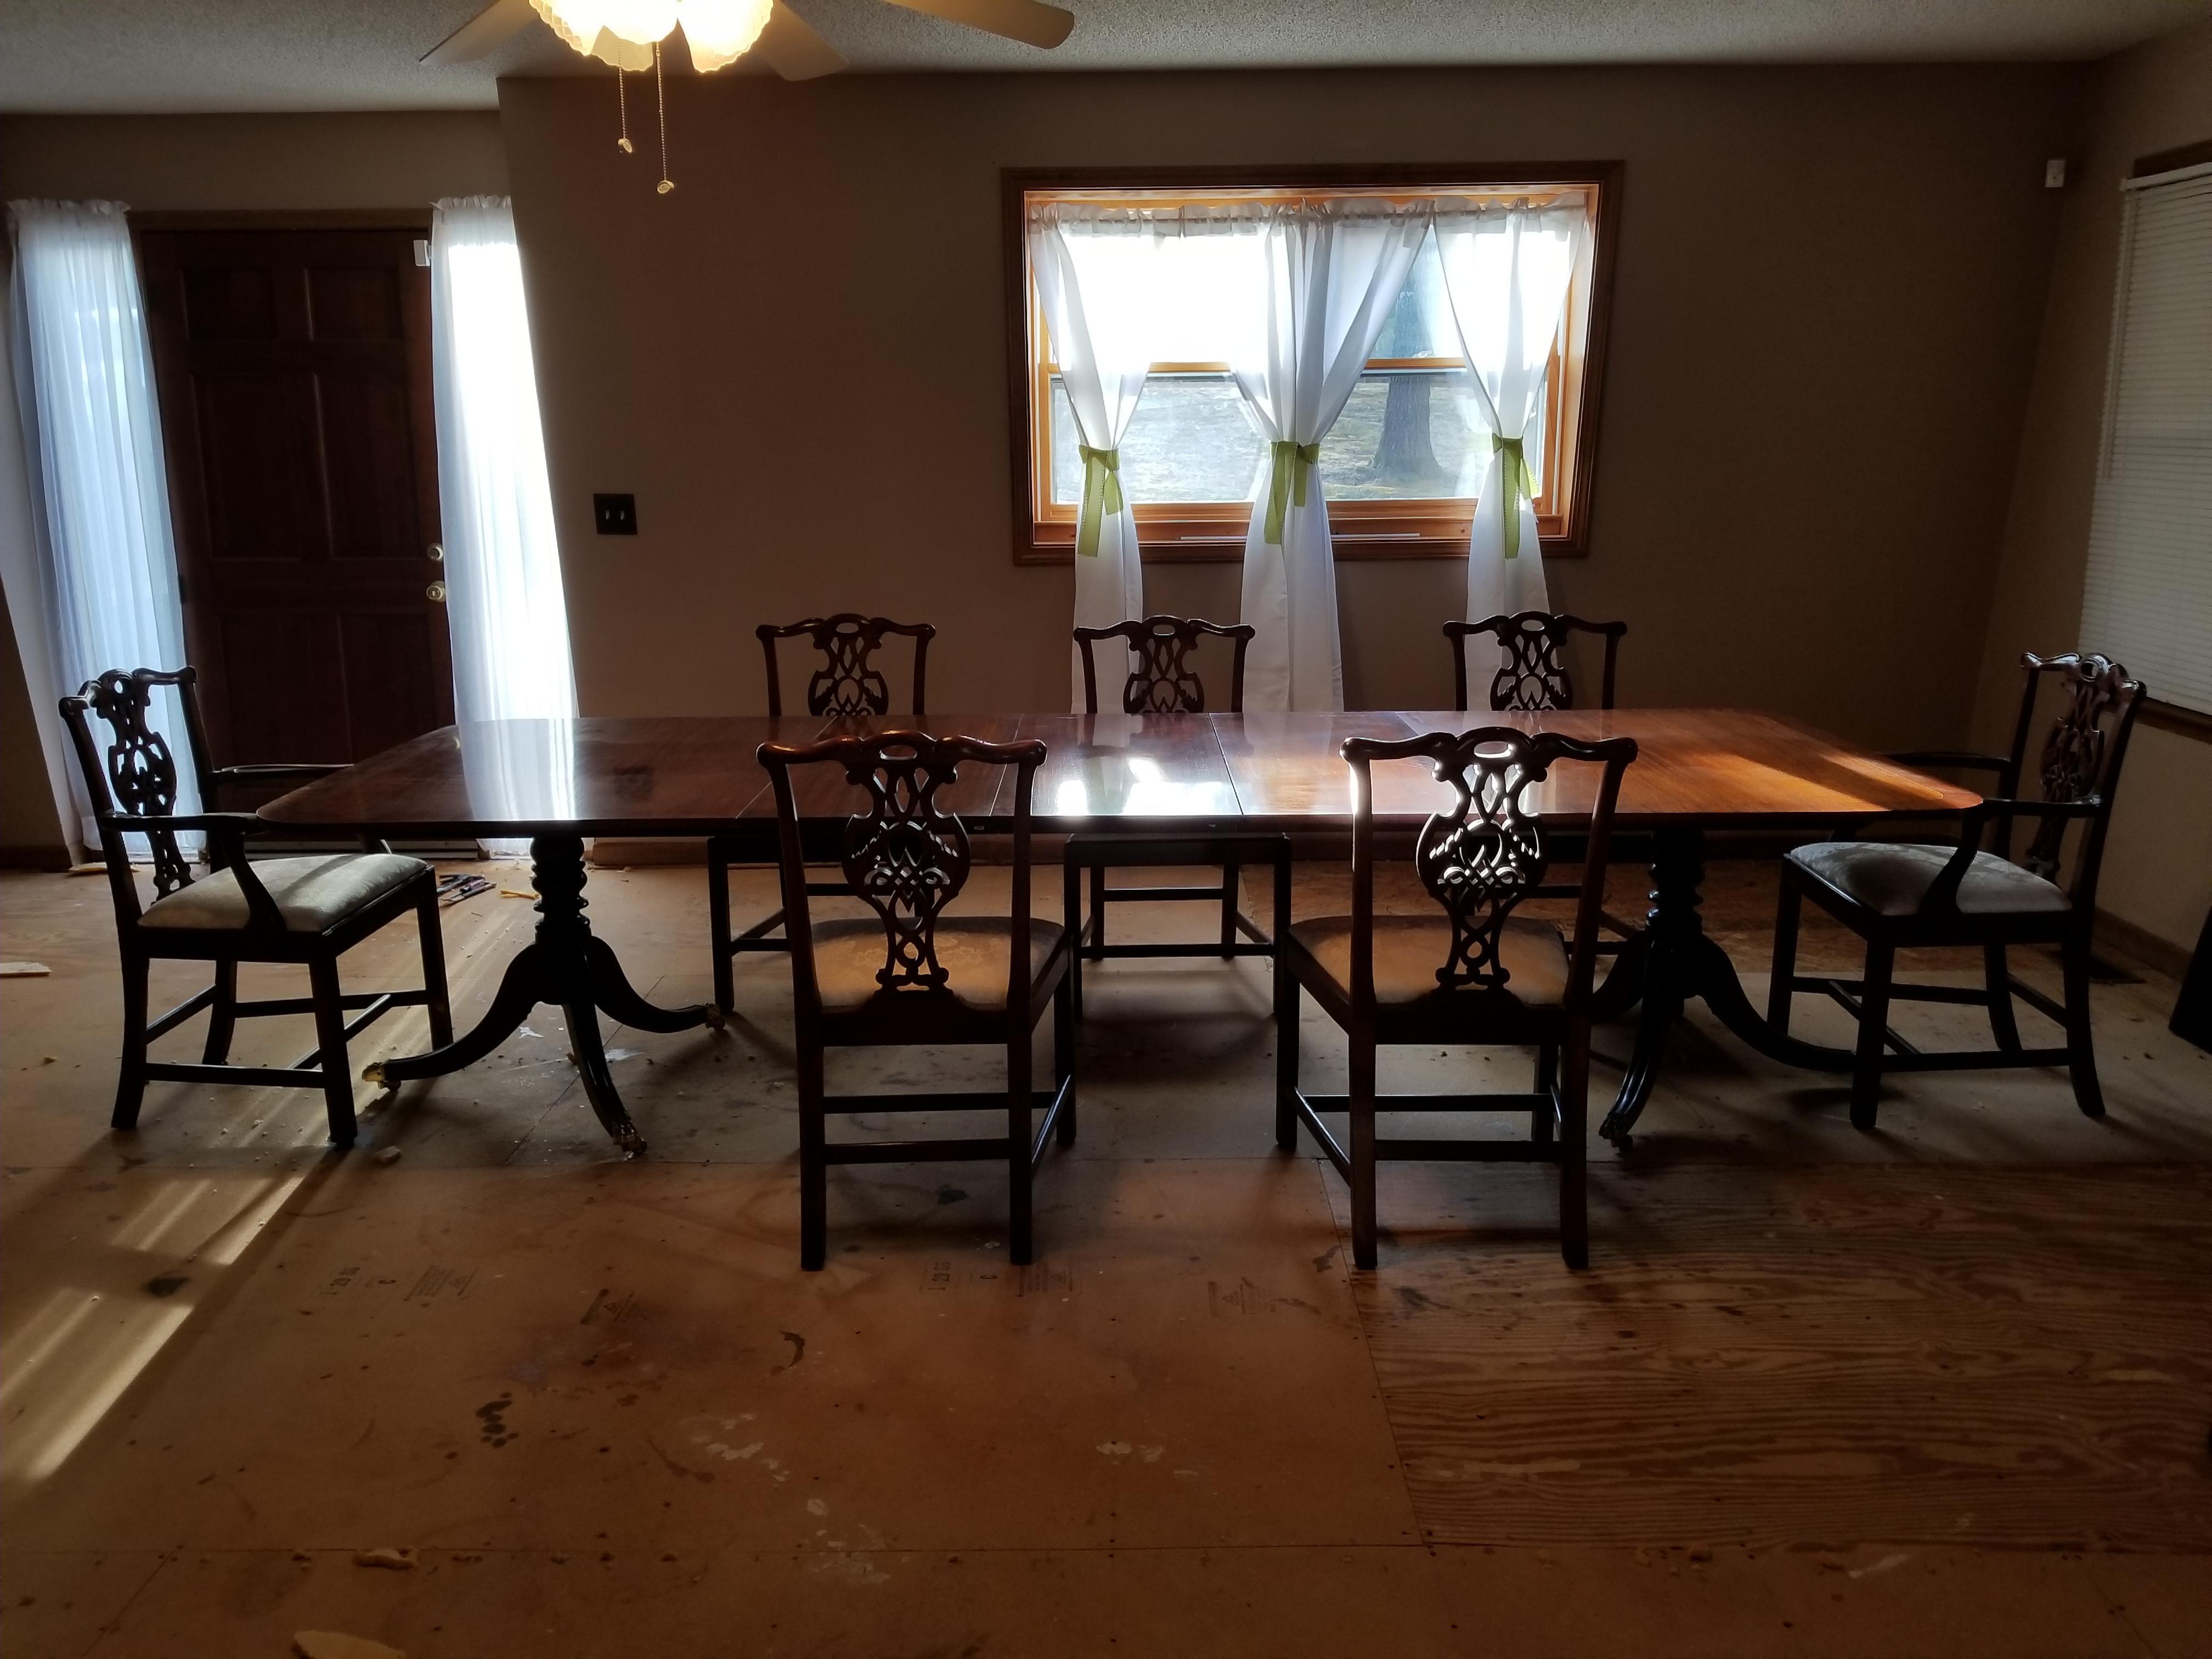 Baker Dining Room Furniture Set Chairish